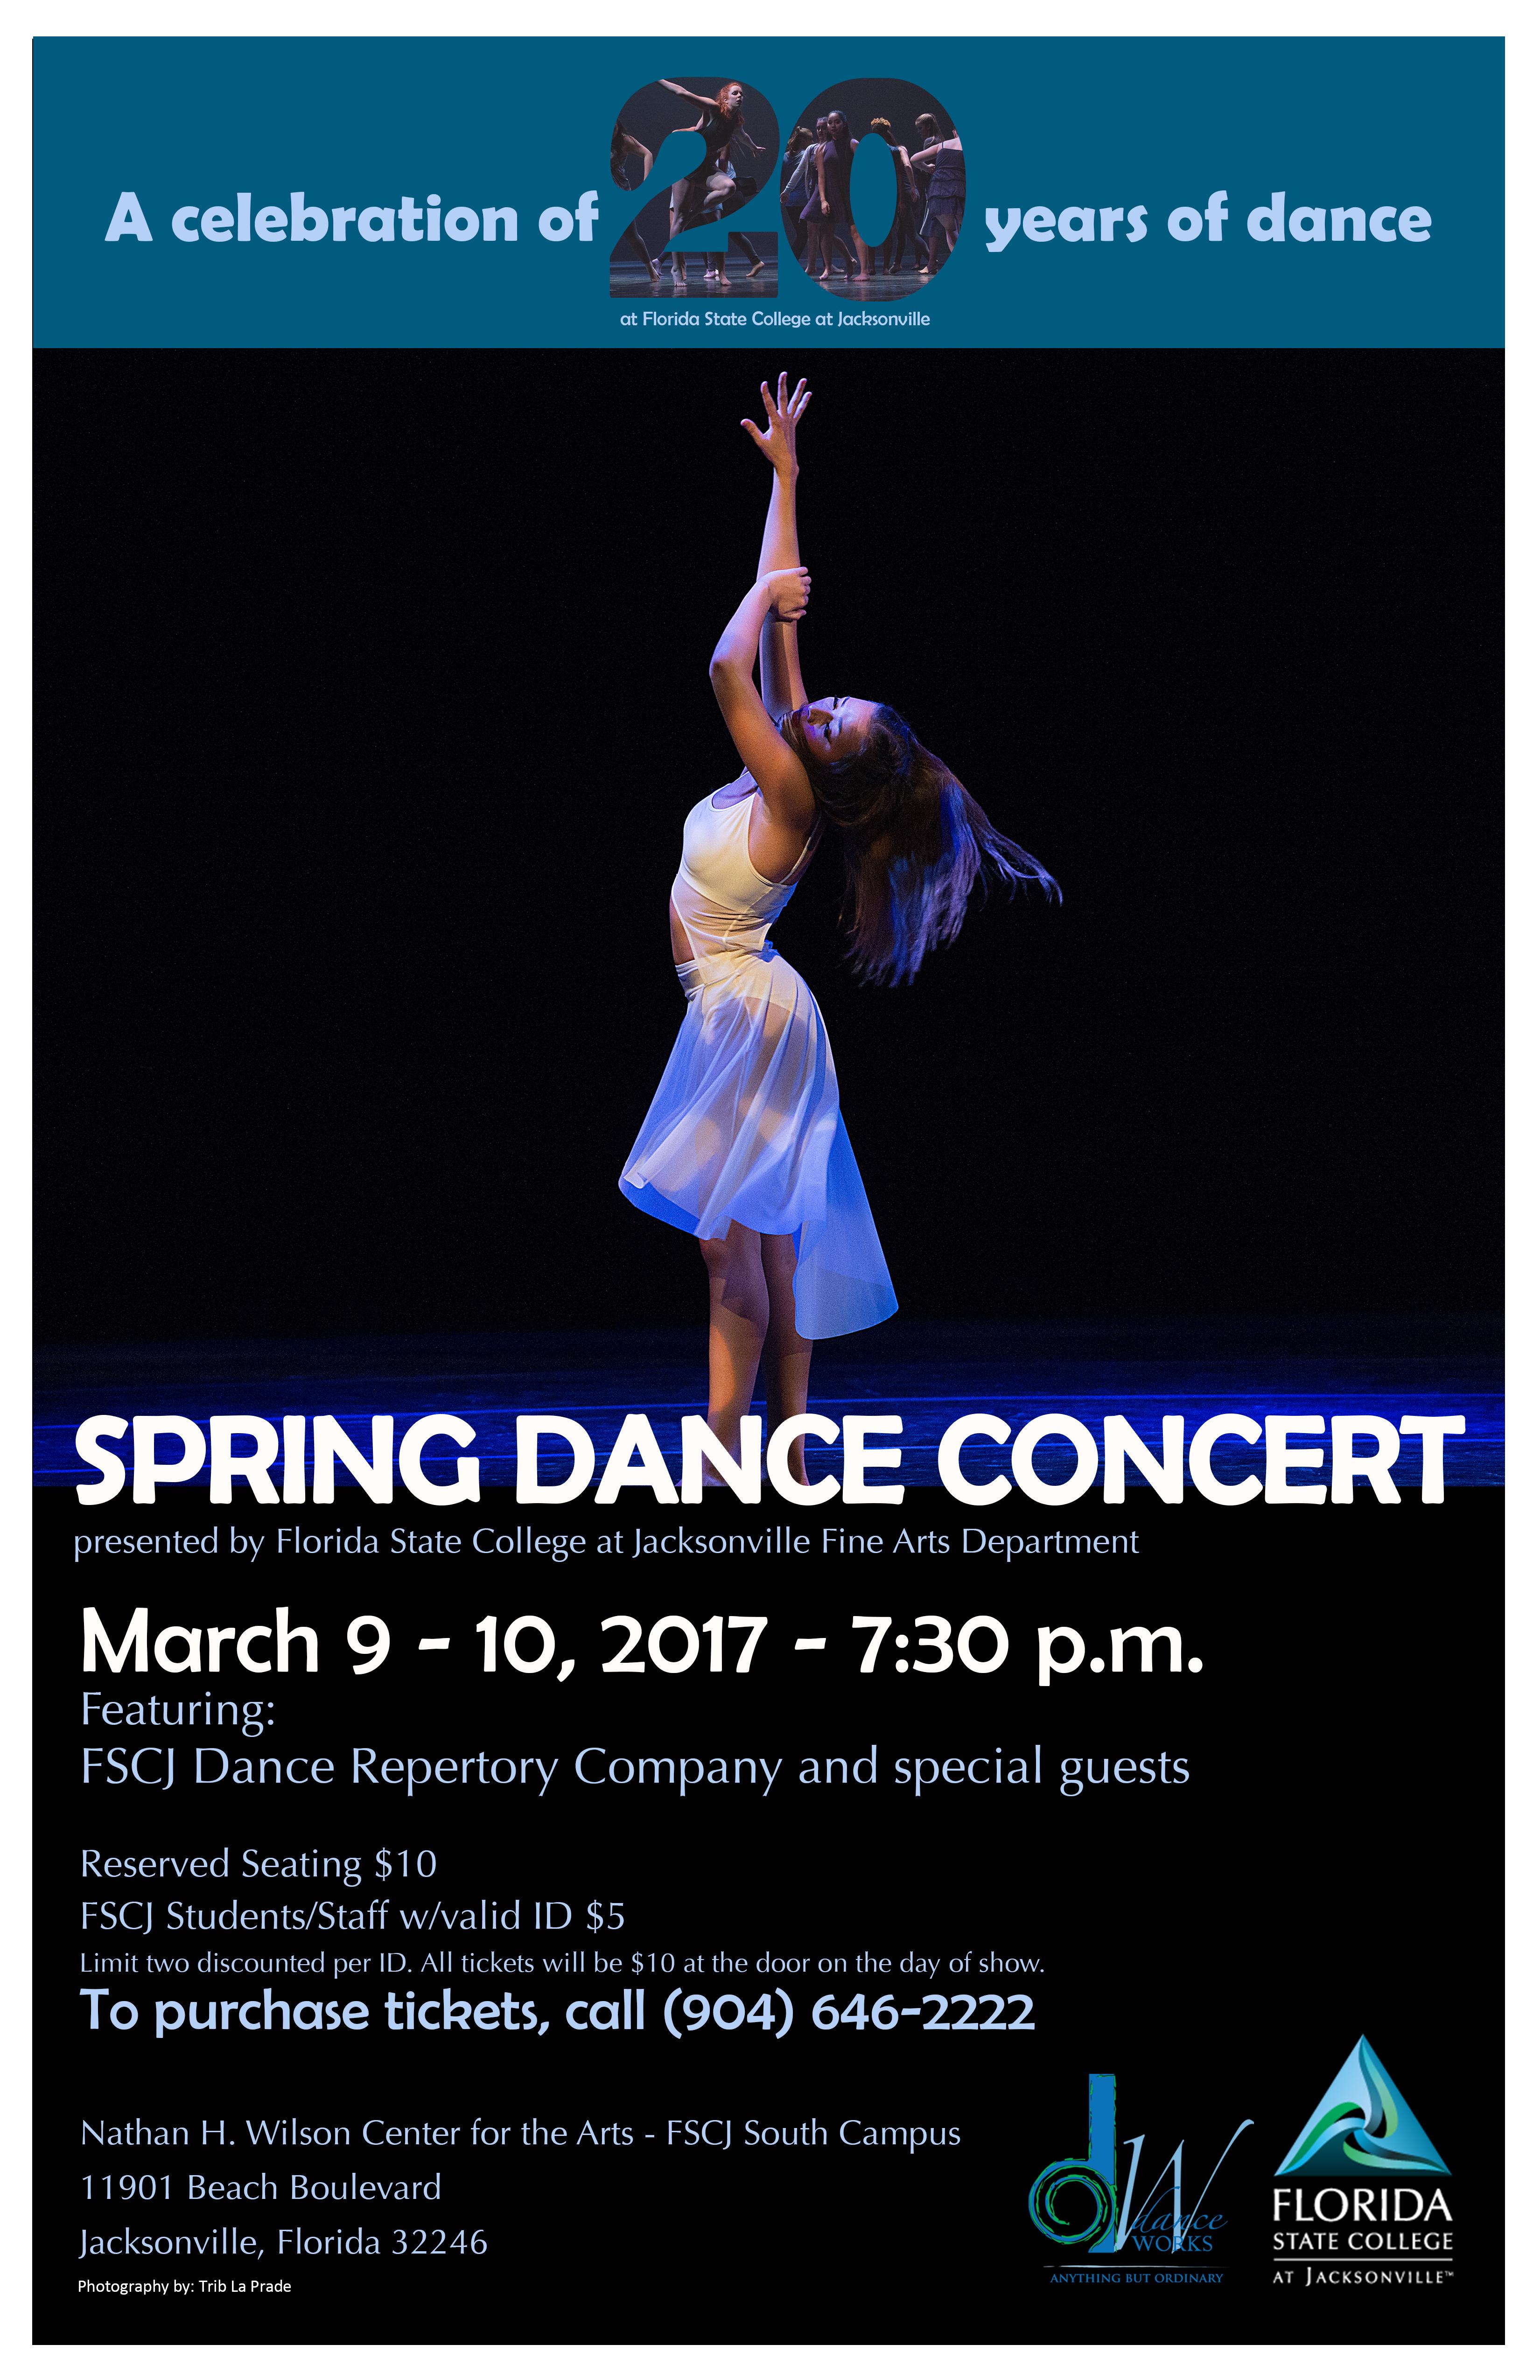 2017 Spring Dance Concert